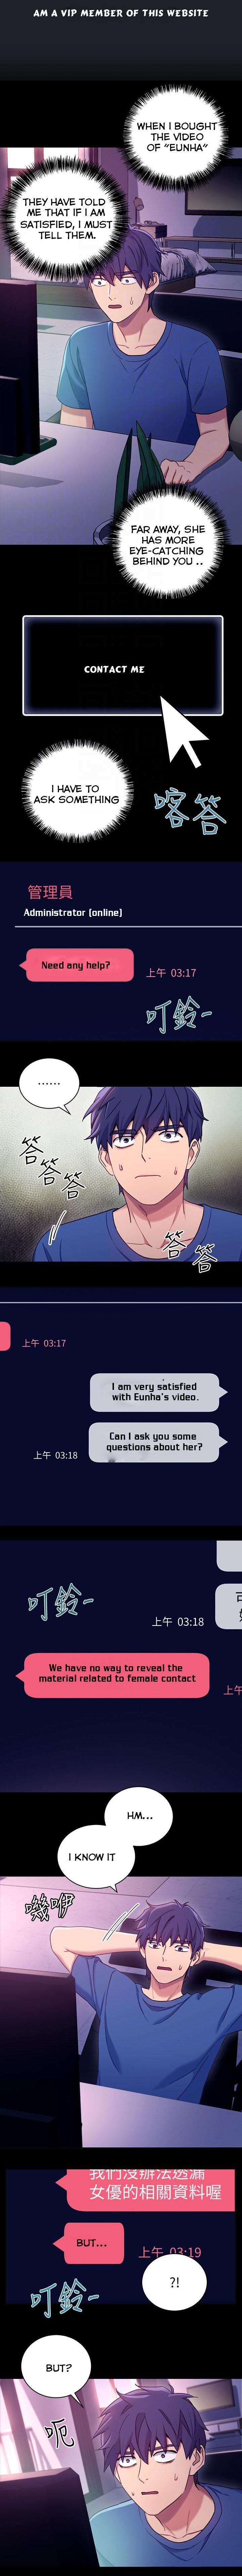 [Neck Pilllow] Stepmother Friends Ch.40/? [English] [Hentai Universe] NEW! 22/10/2020 84